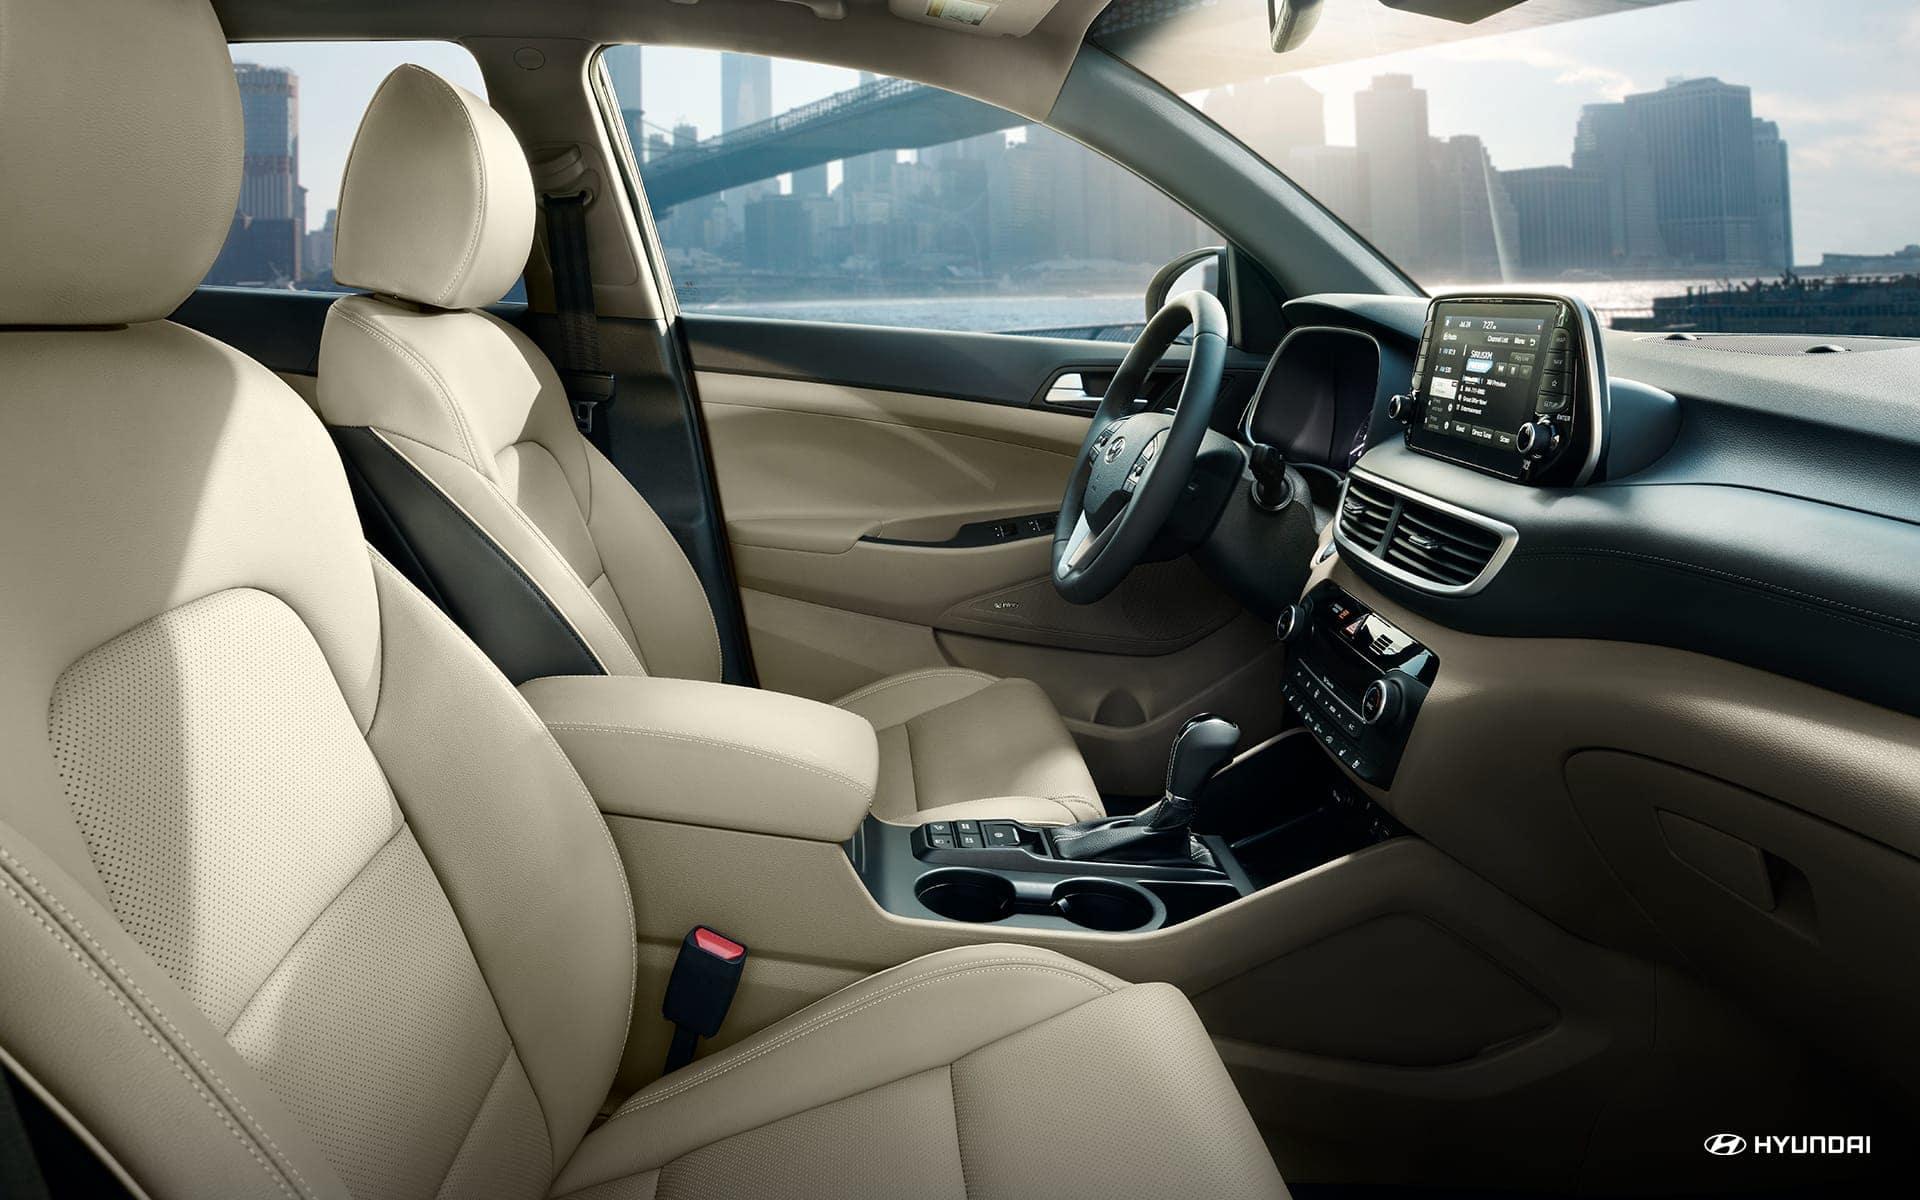 2020 Hyundai Tucson interior leather seats